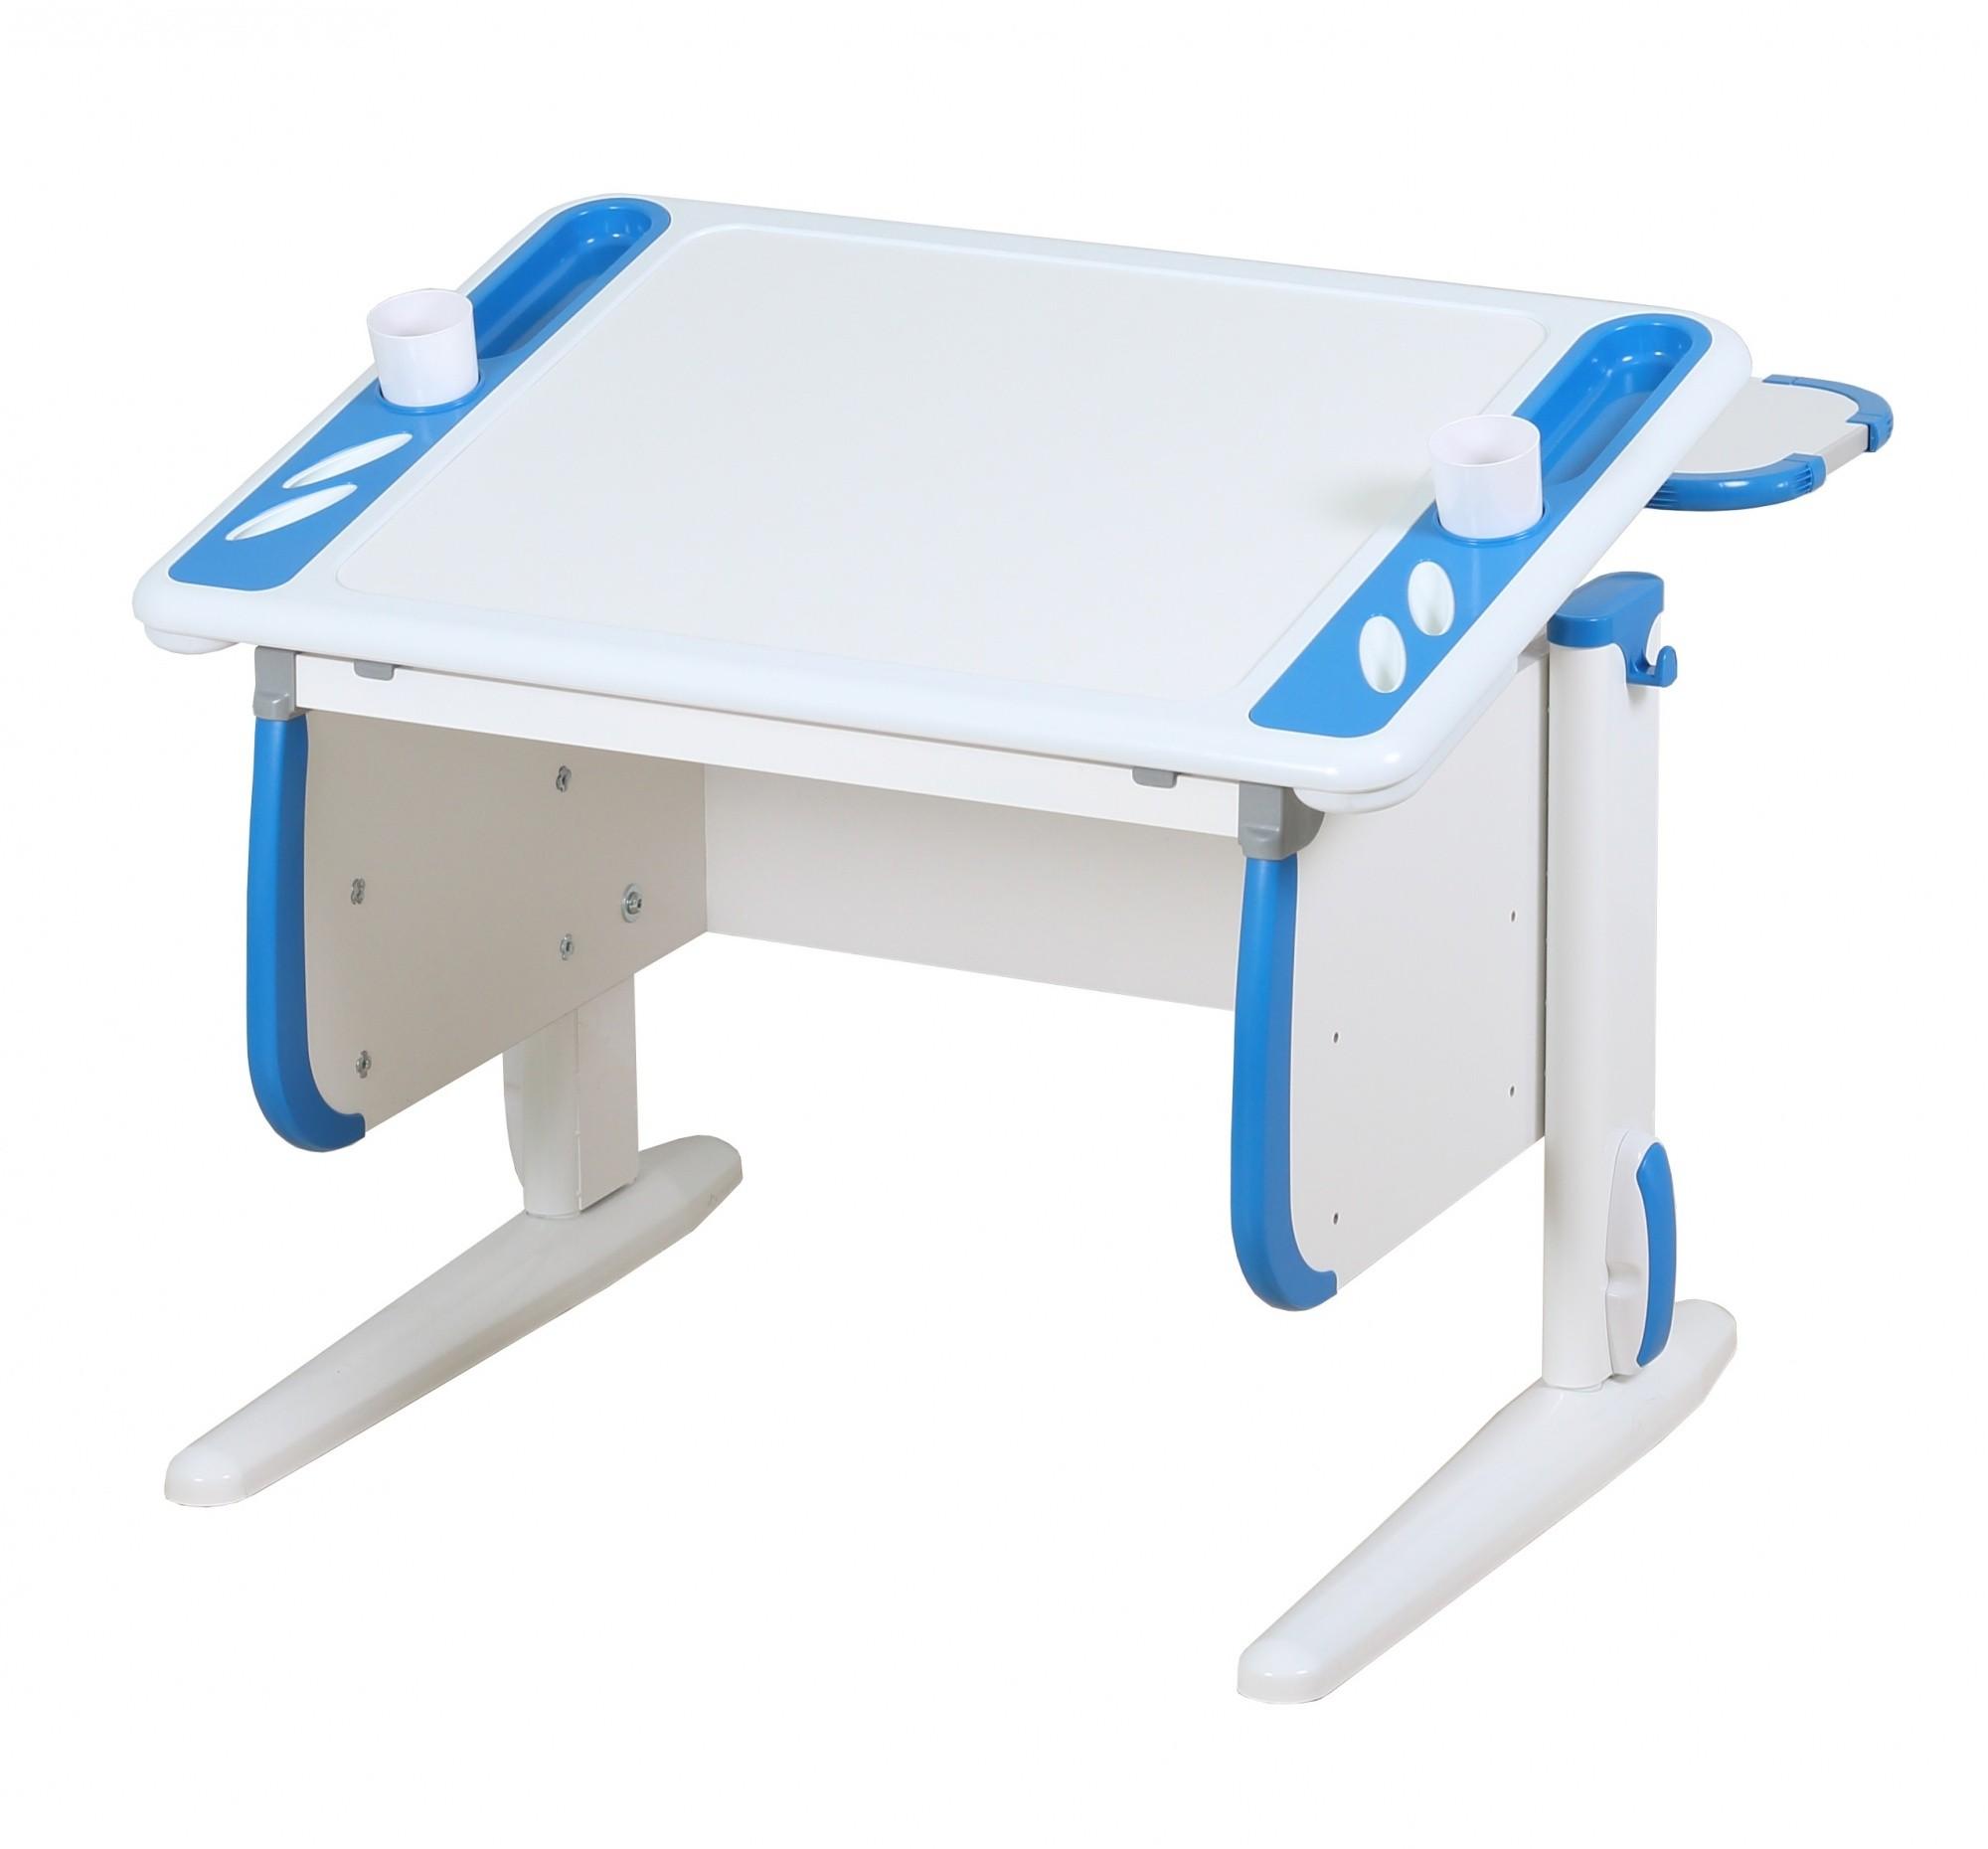 Парта Дэми White-Techno Mini СУТ-26-01 Белый СинийПарты и столы<br><br>Цвет материала: Белый; Цвет: Синий; Бренд: Дэми; Ширина (см): 80; Глубина (см): 80; Высота (см): 53-81,5;